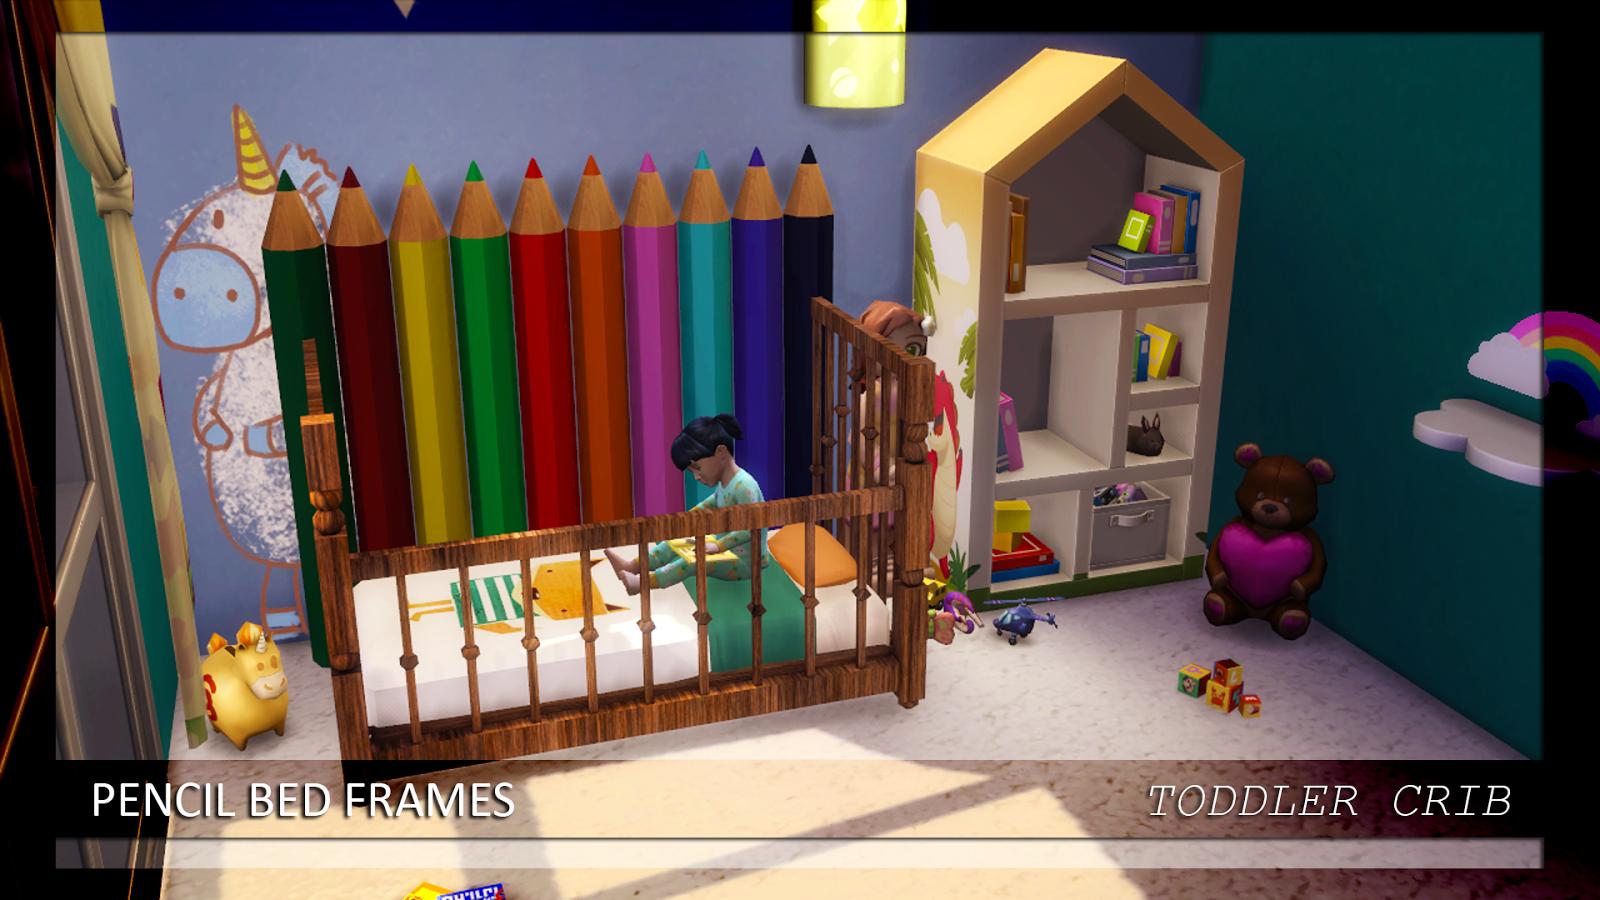 Enure Sims Pencil Bed Frames Double Single Toddler Crib